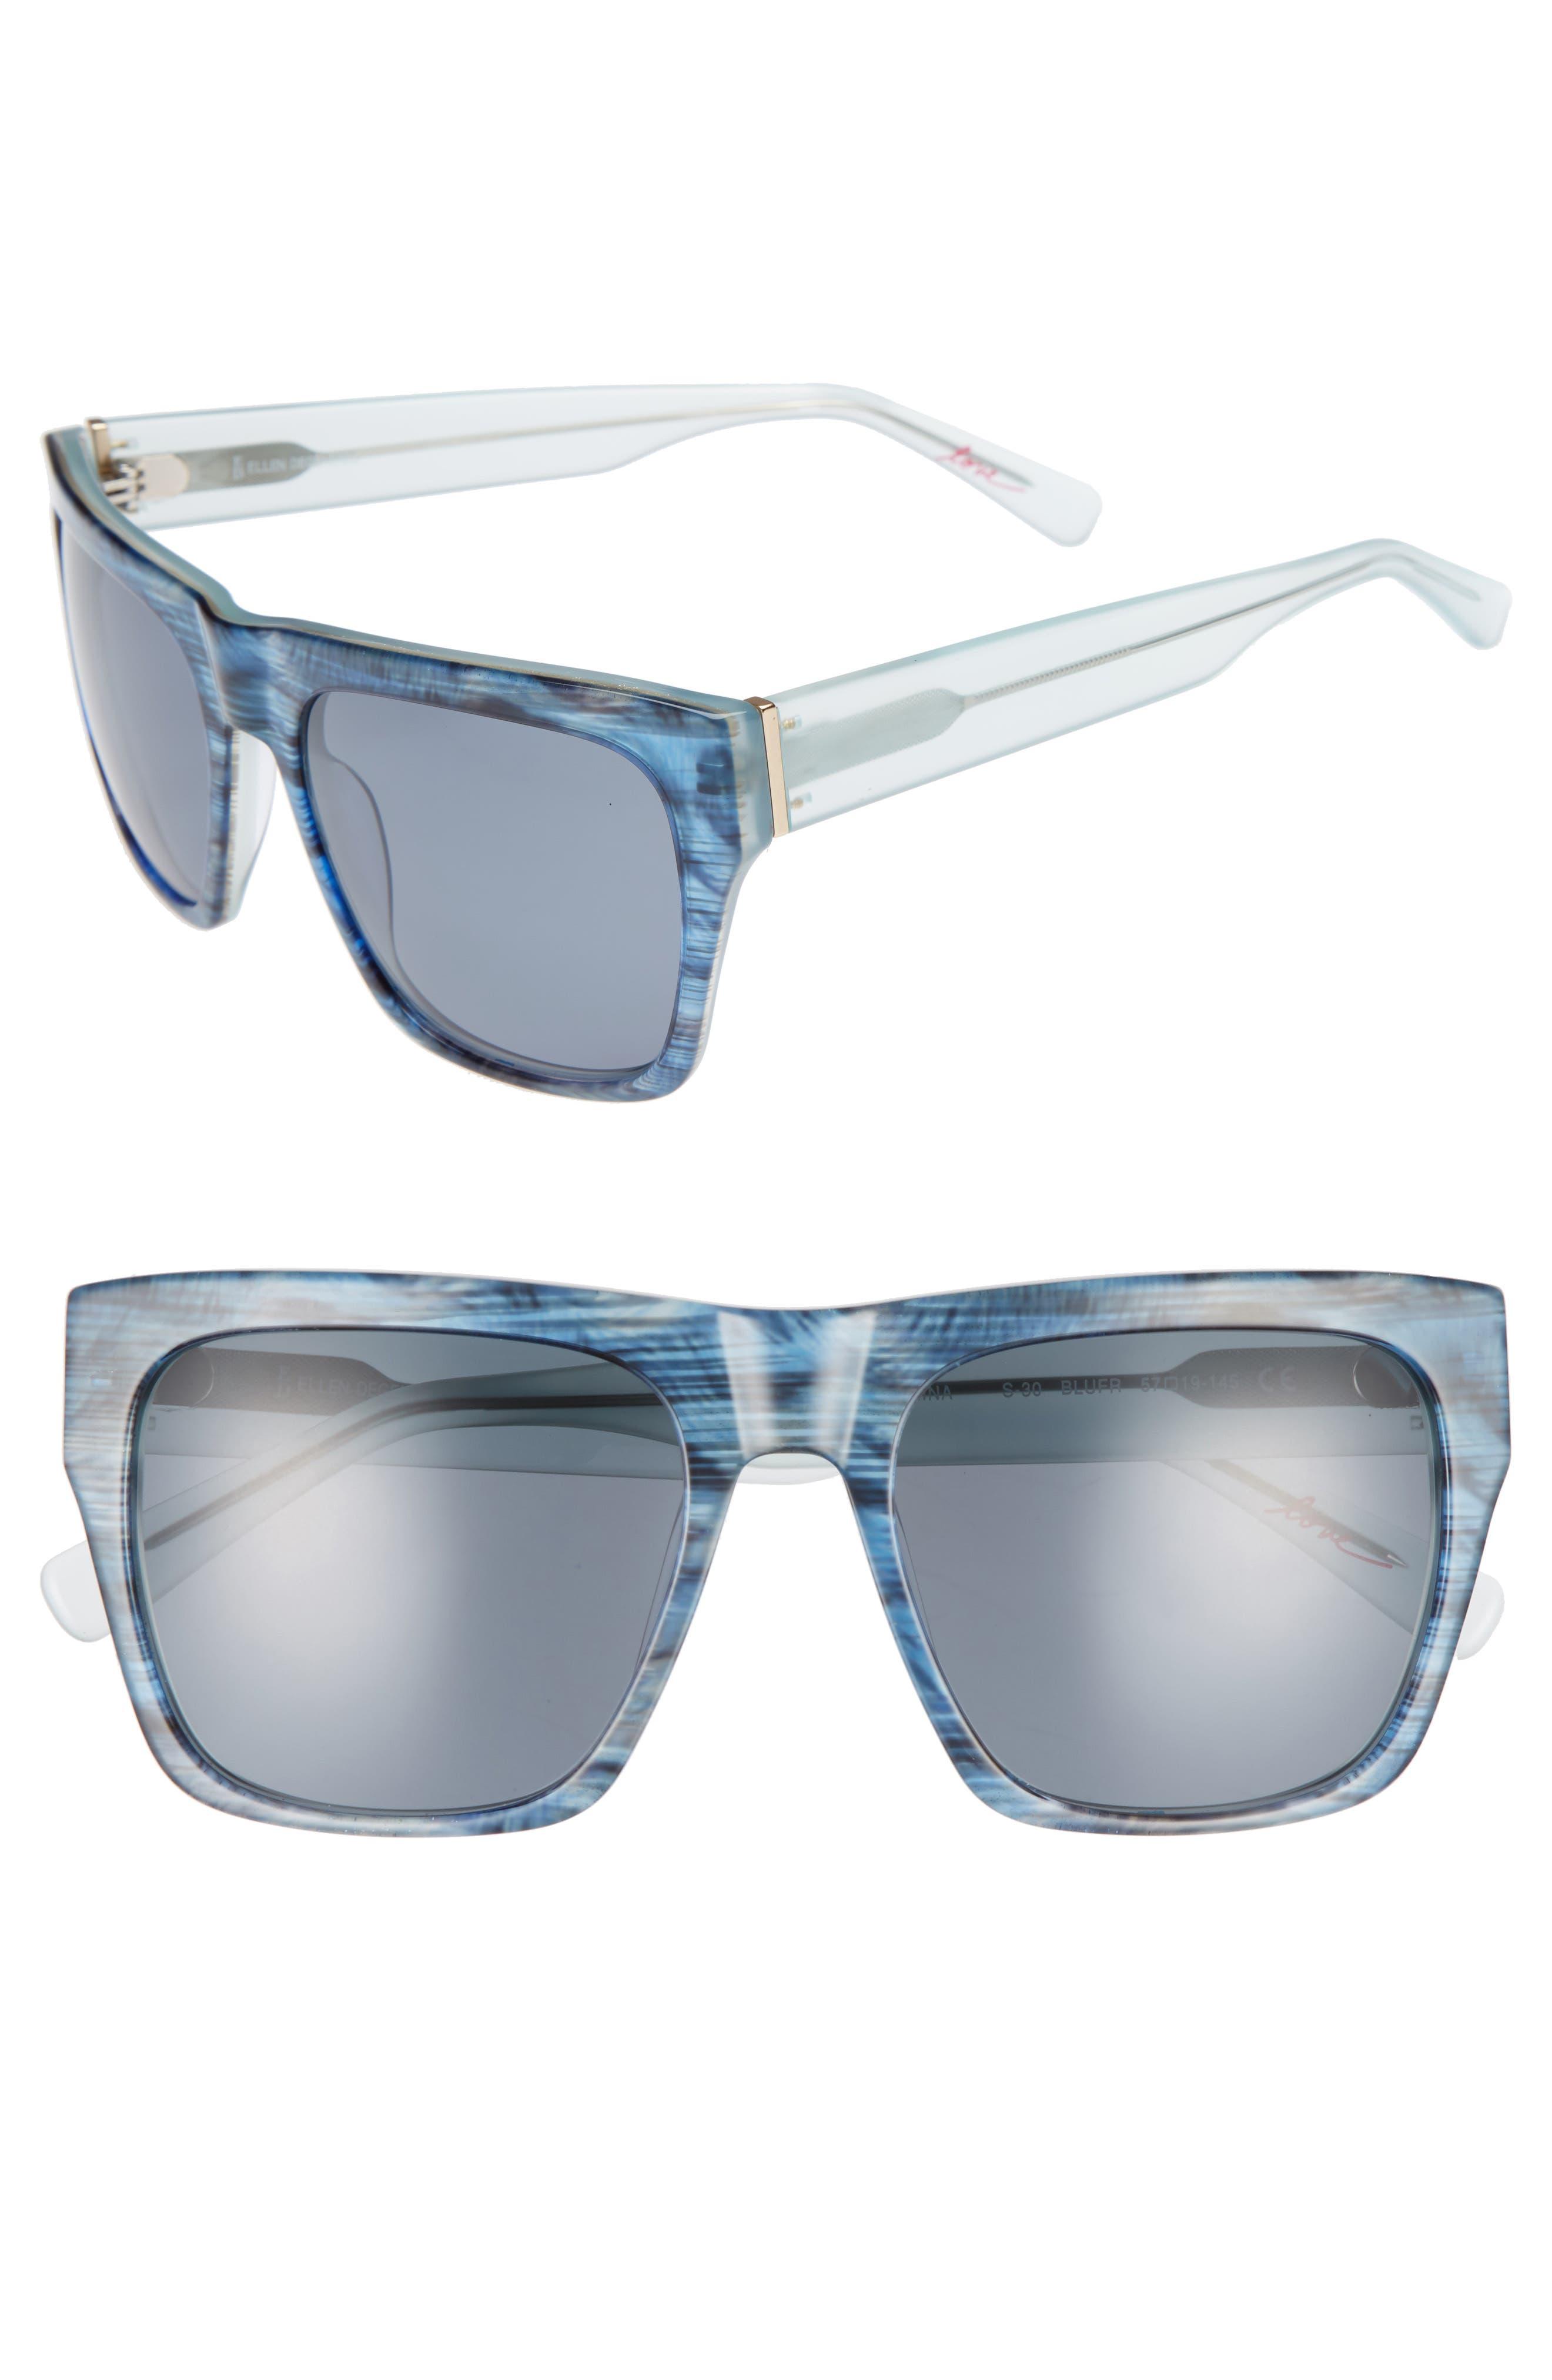 57mm Gradient Square Sunglasses,                             Main thumbnail 1, color,                             BLUE FEATHER